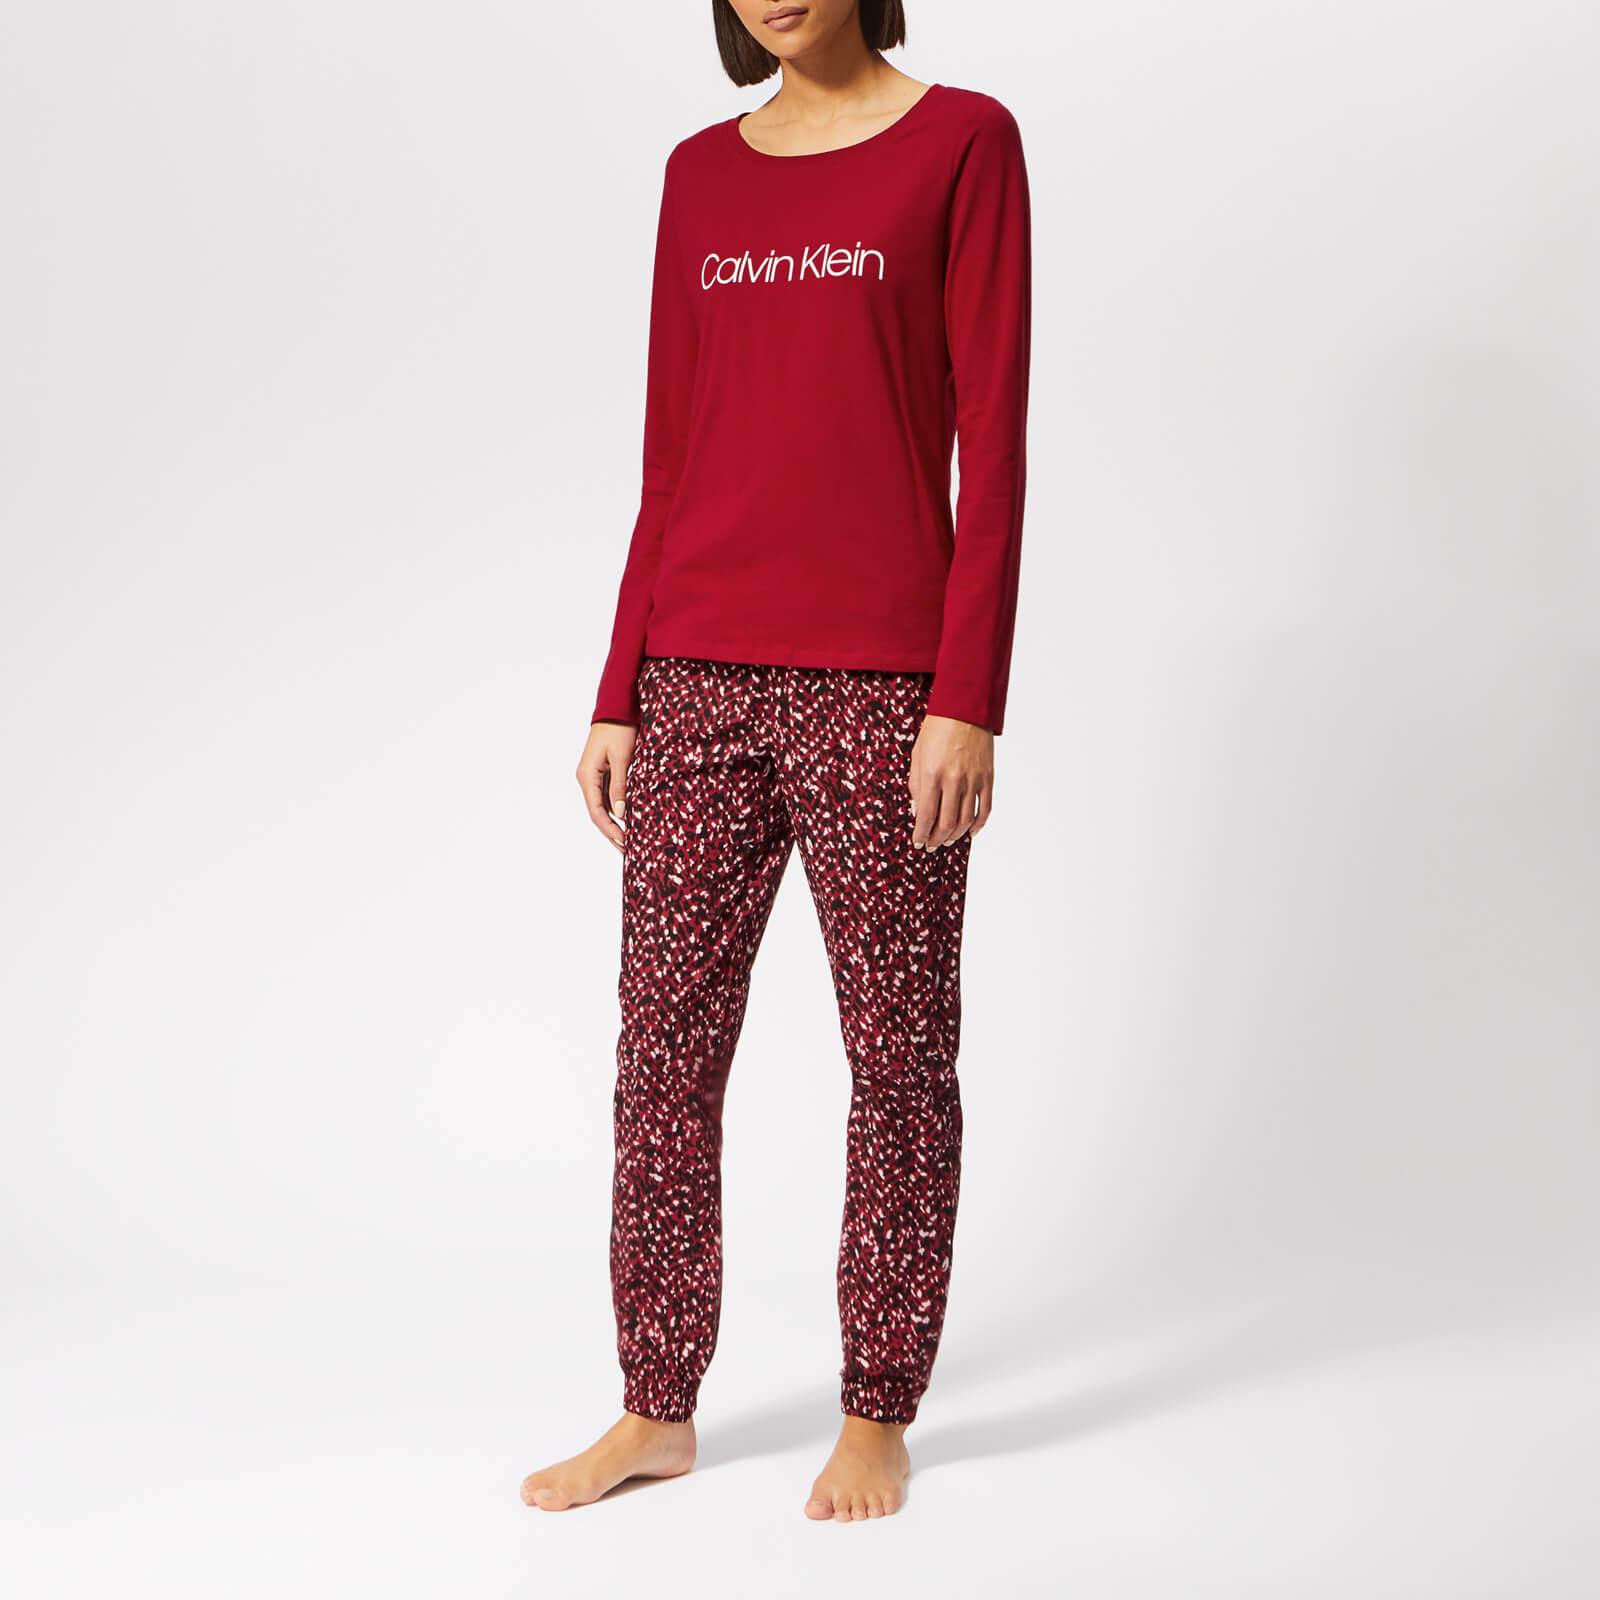 Calvin Klein Women's PJ Gift Set - Red - S - Red